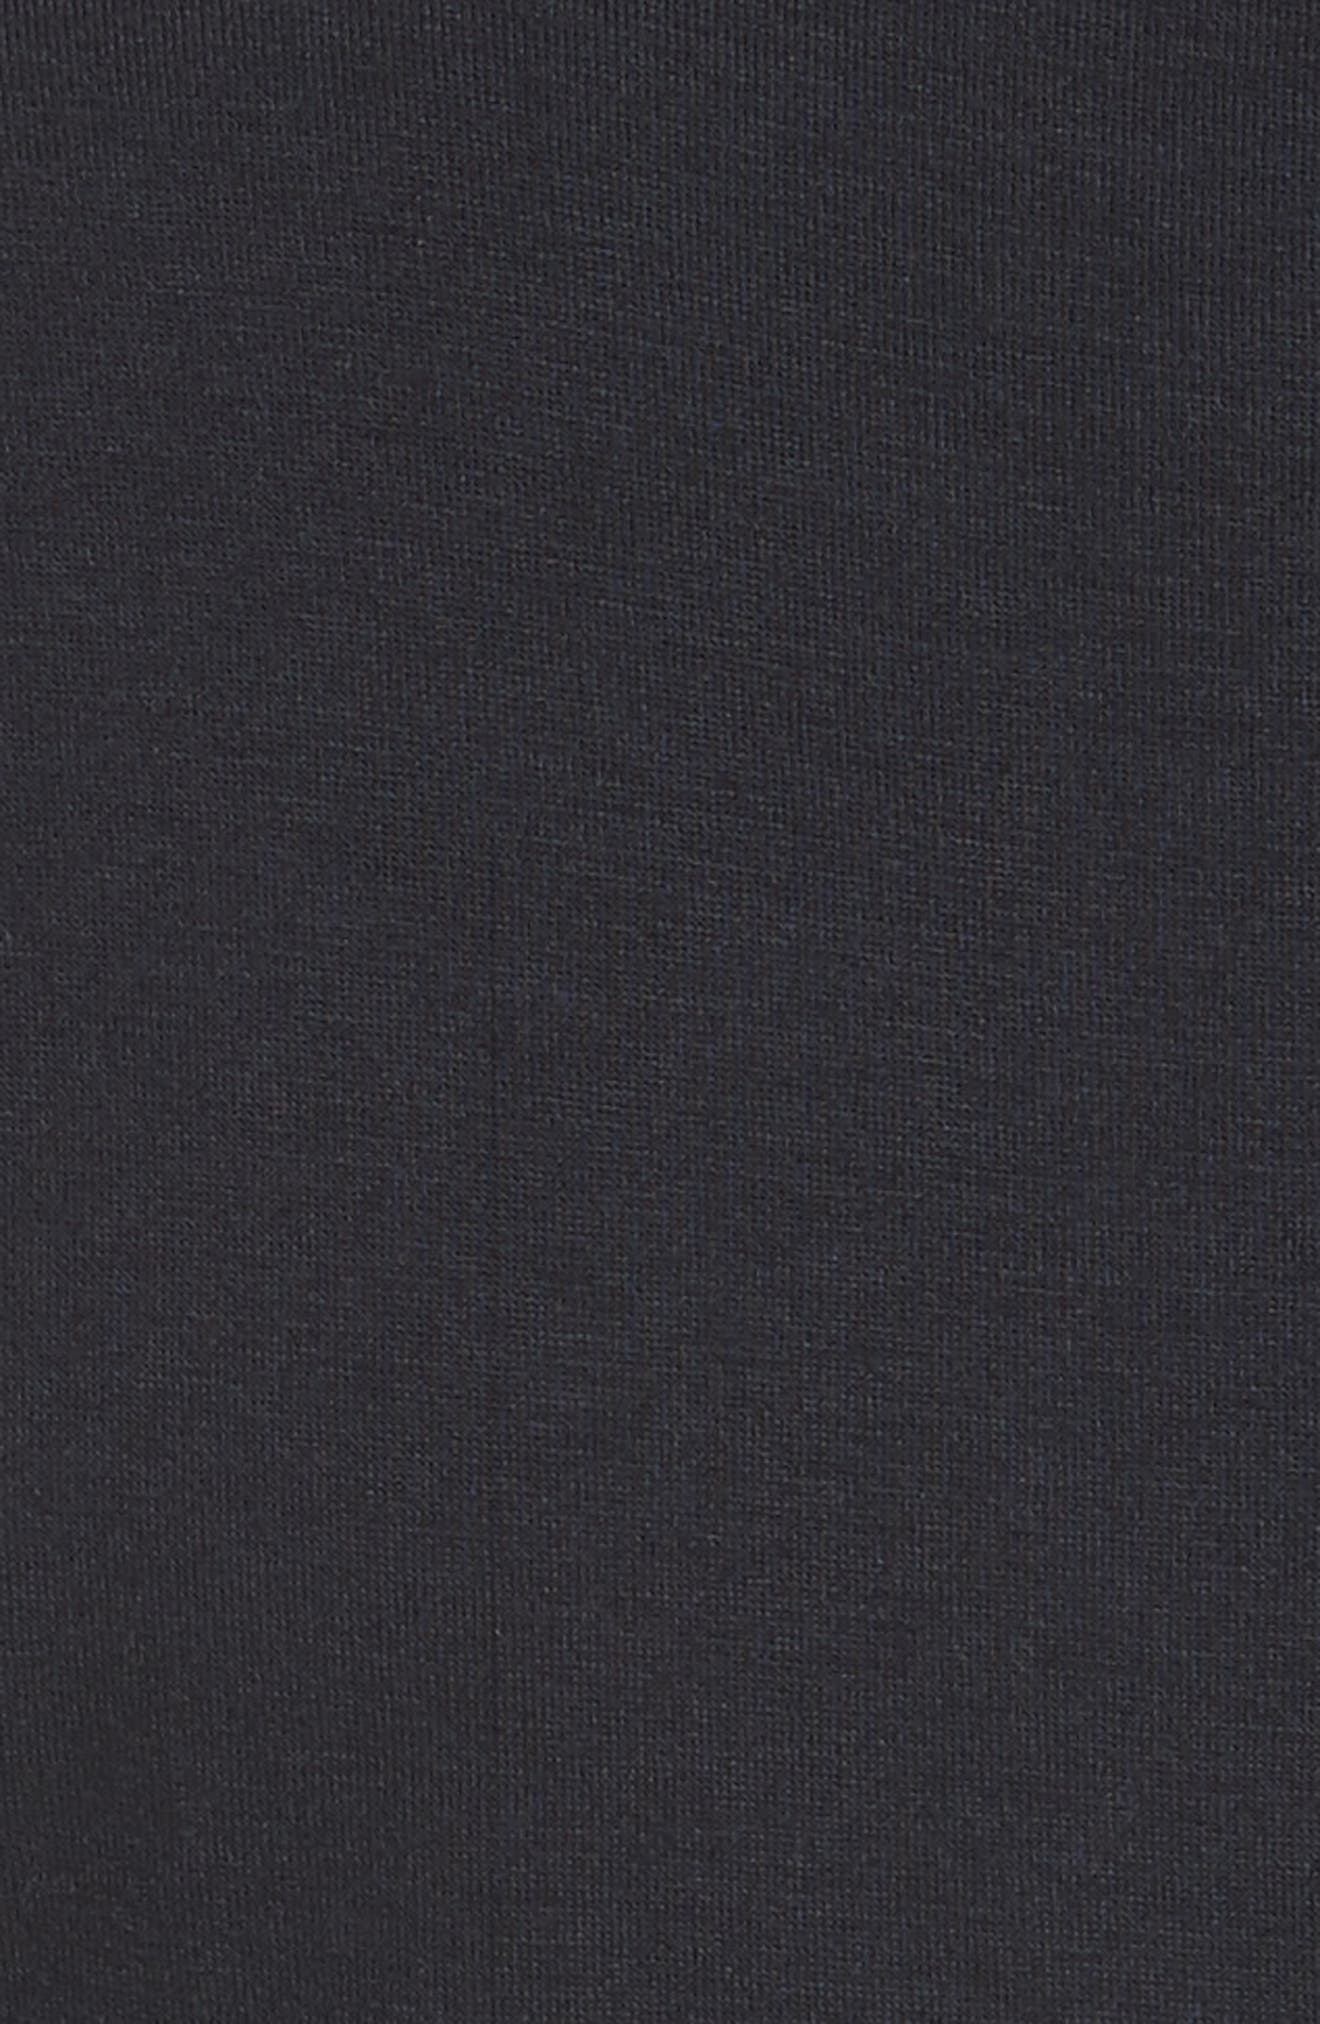 Petalo Twisted Dress,                             Alternate thumbnail 5, color,                             Navy Blue